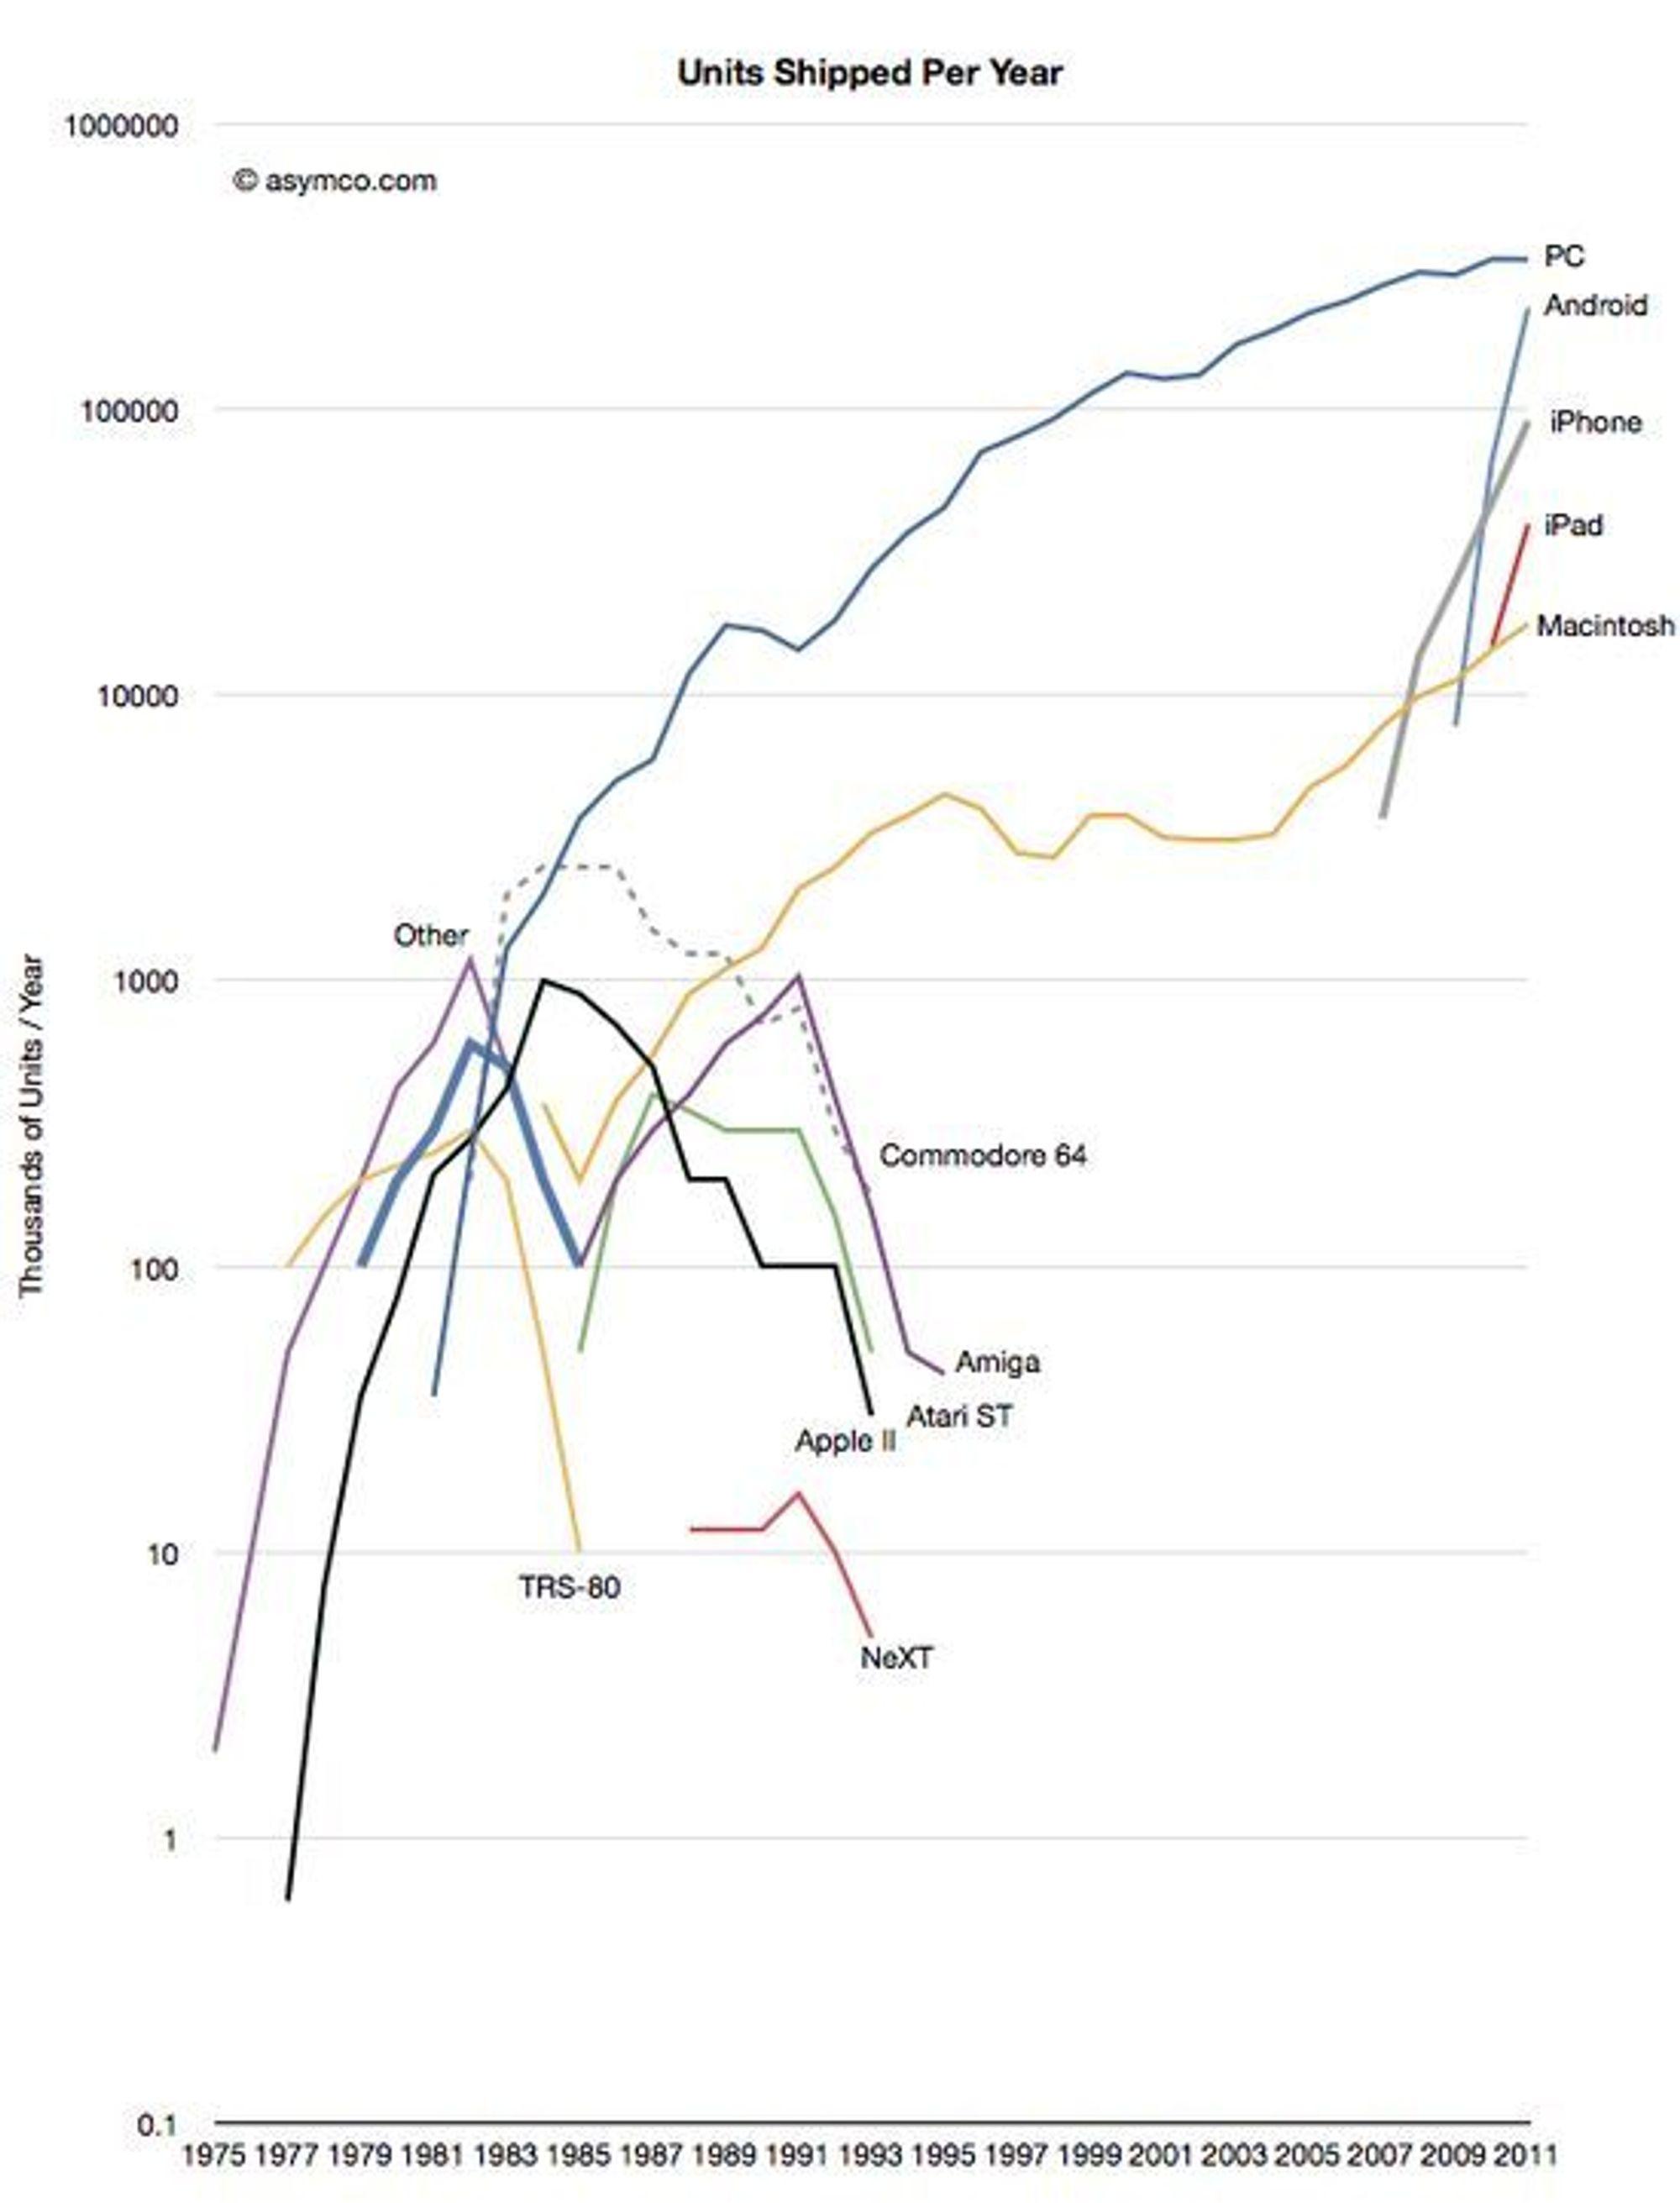 Salgstall for utvalgte IT-plattformer 1975-2011.